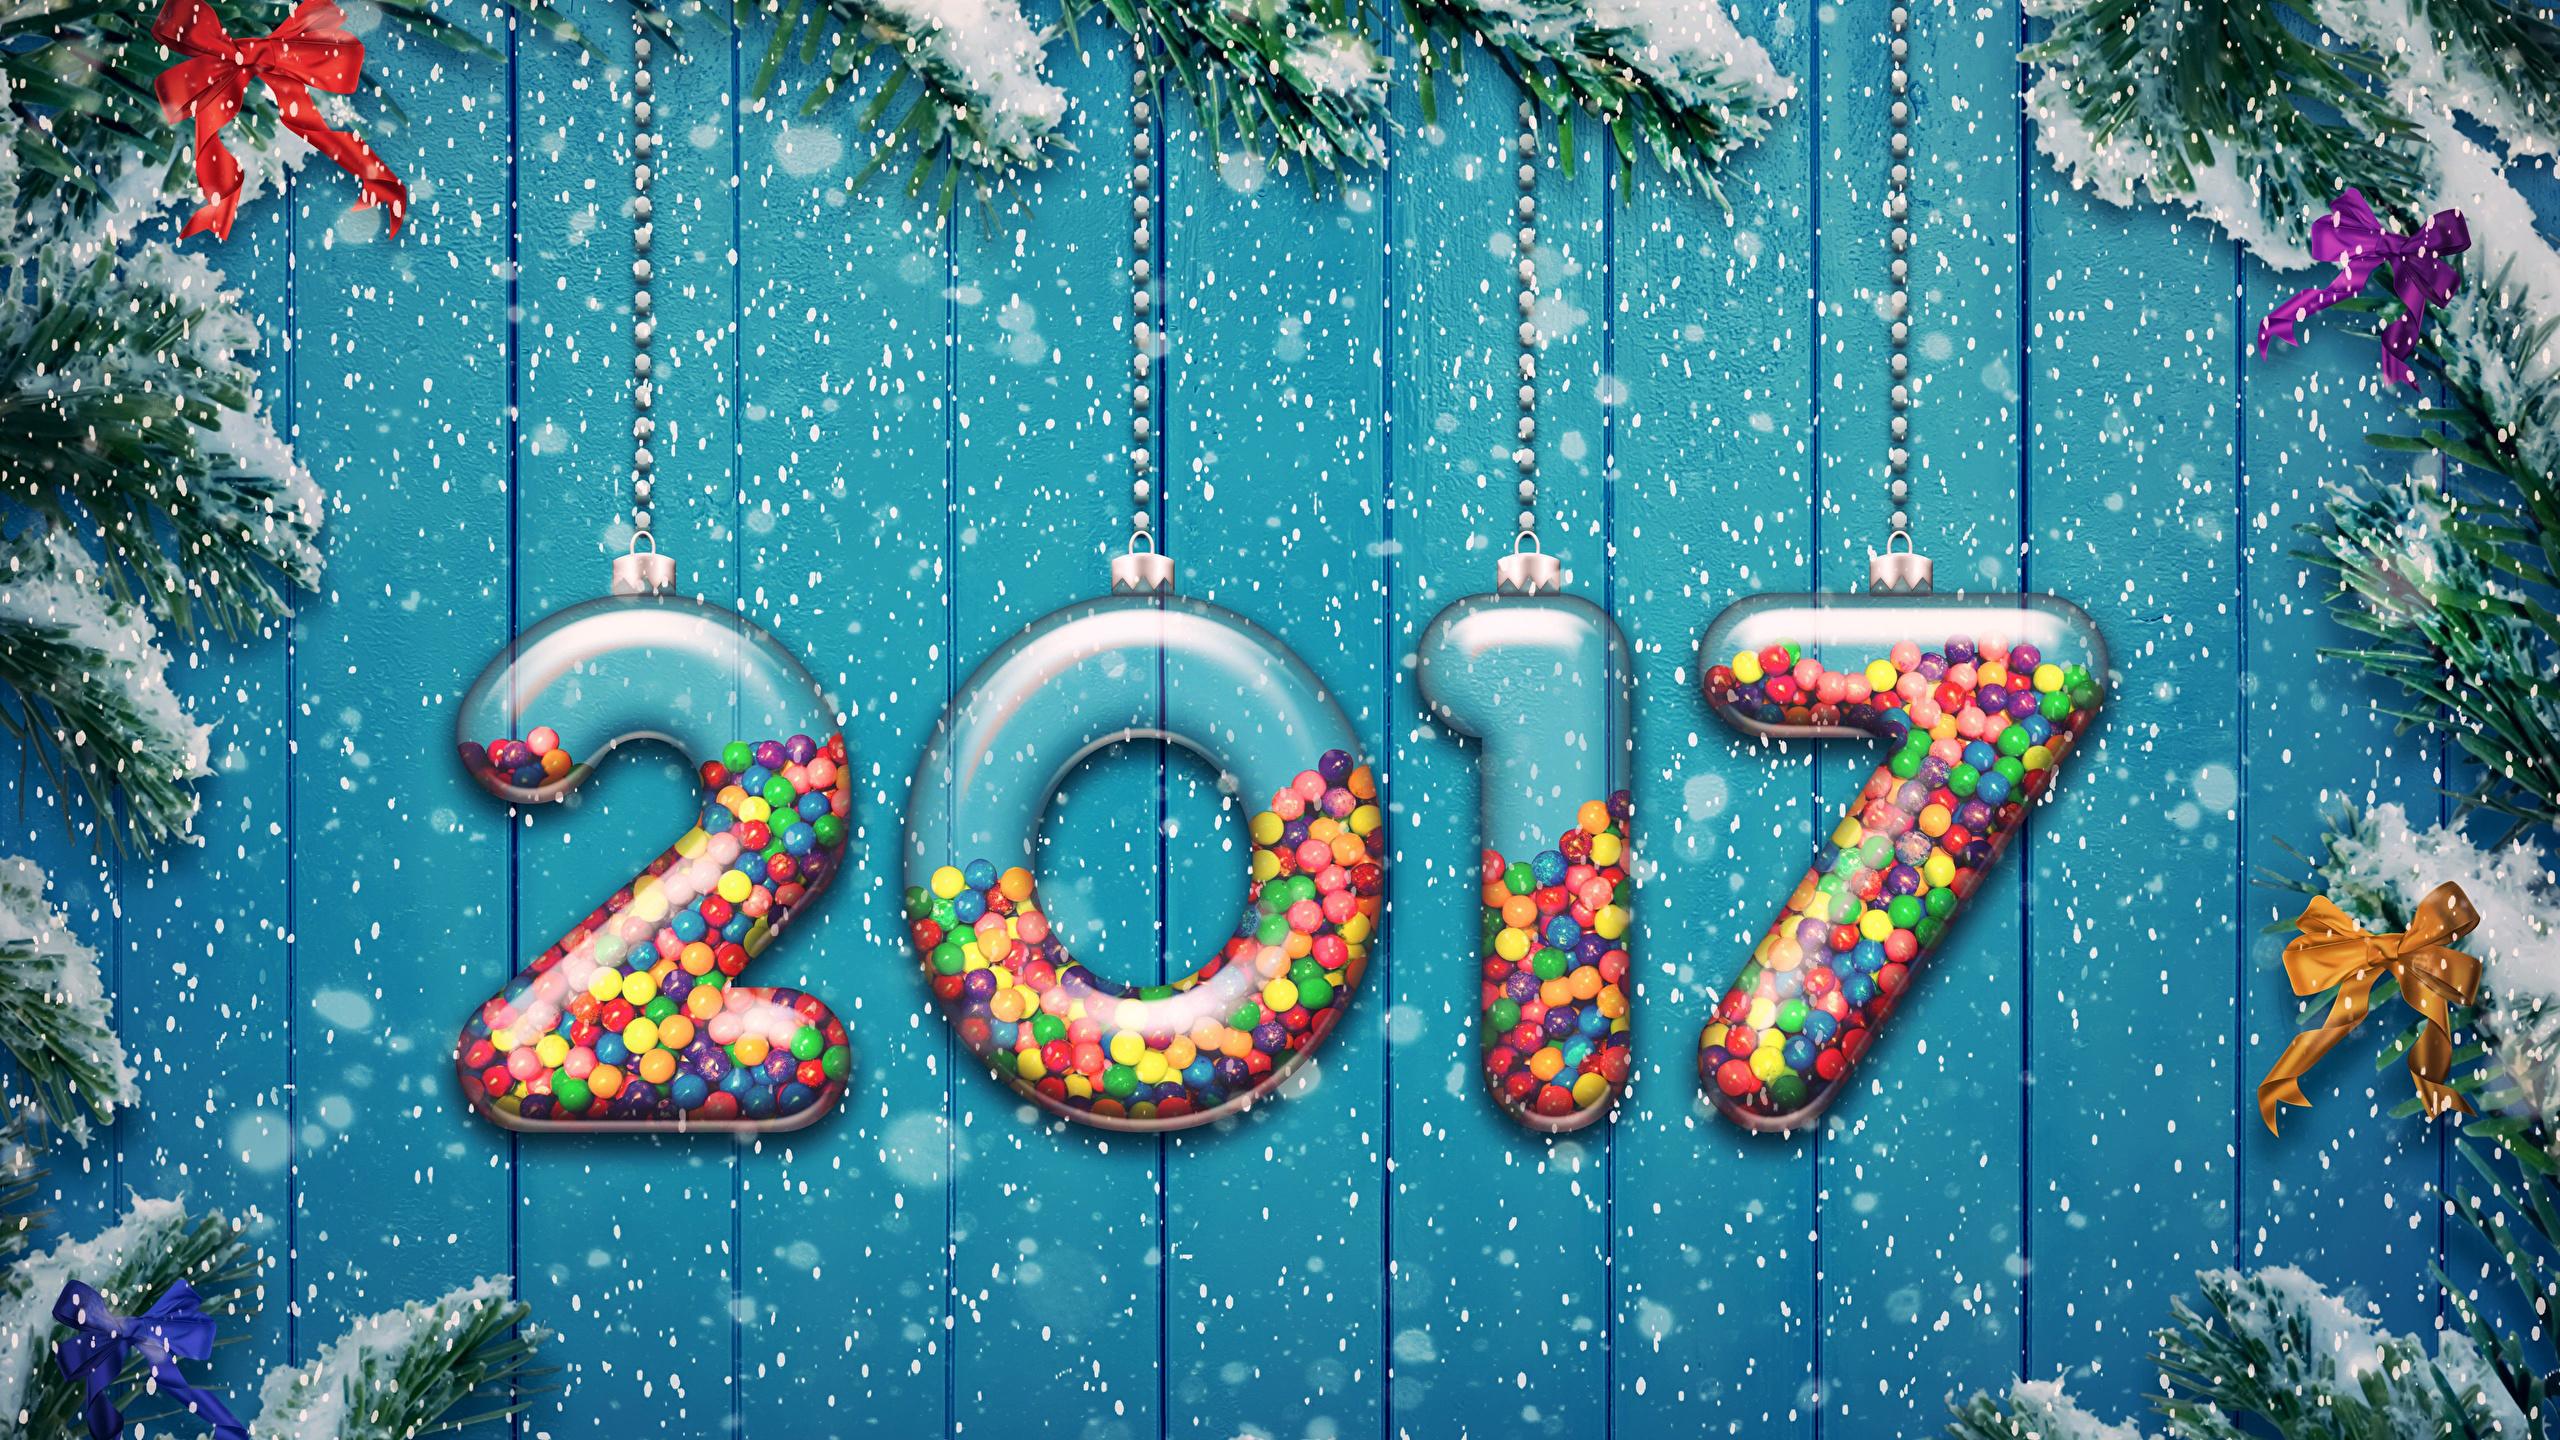 Wallpaper 2017 Christmas New Year Tree Snow Bowknot 2560x1440